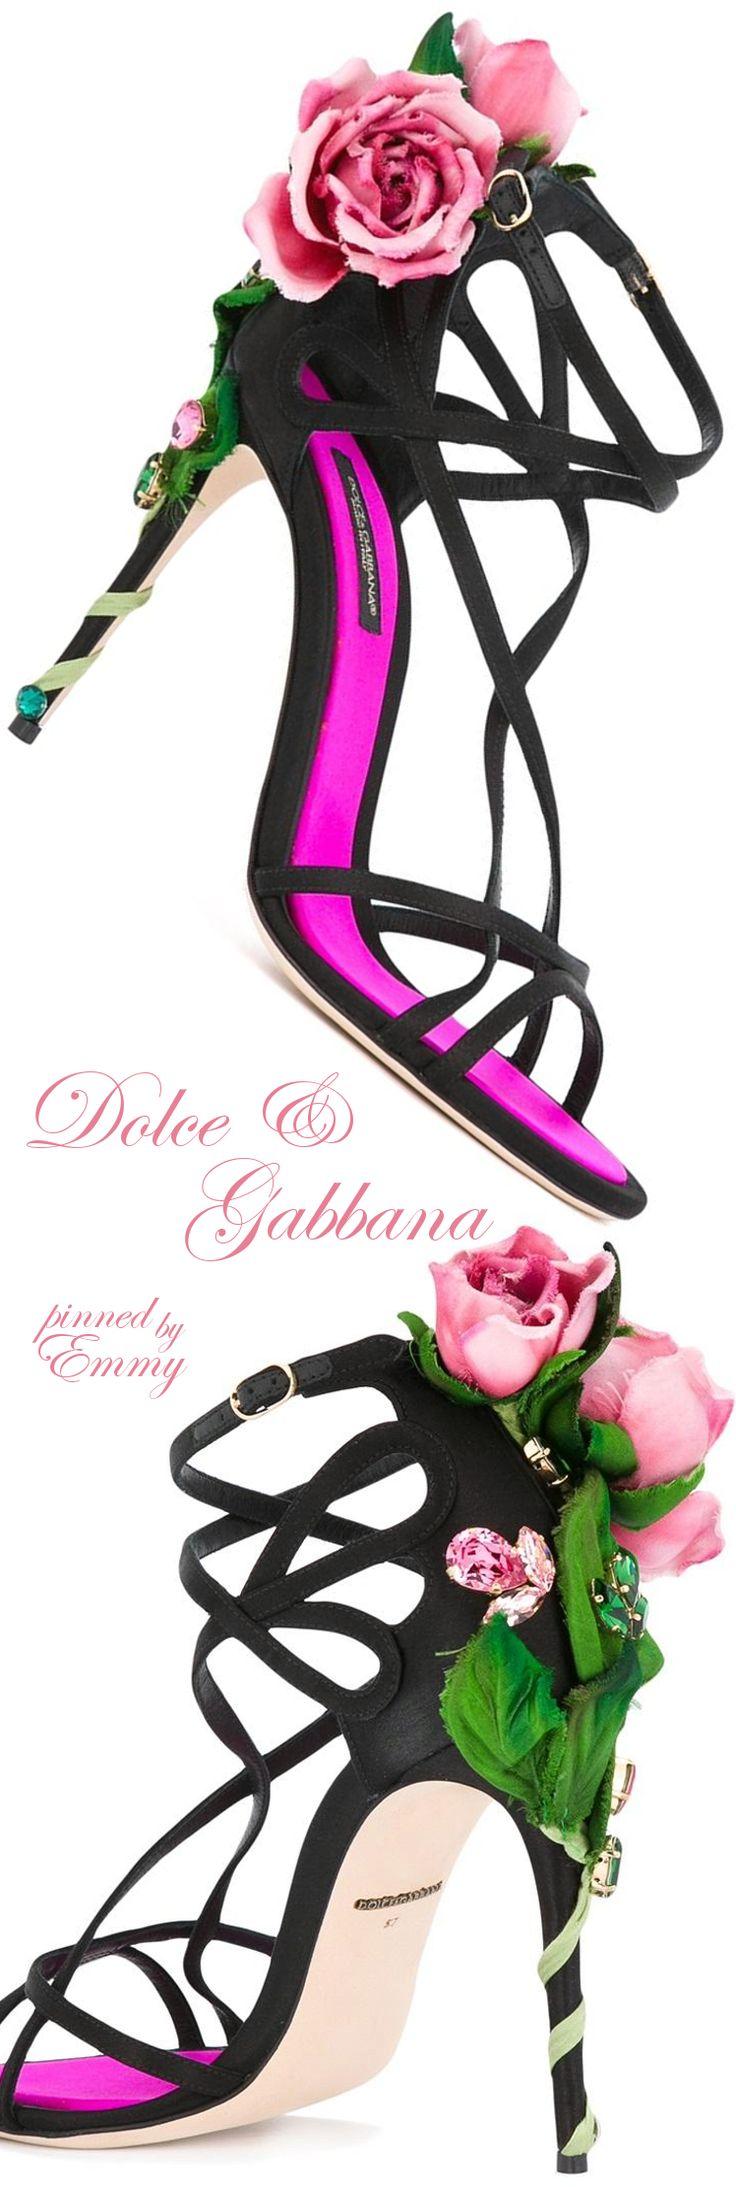 Dolce & Gabbana 'Kira' #sandals #roses